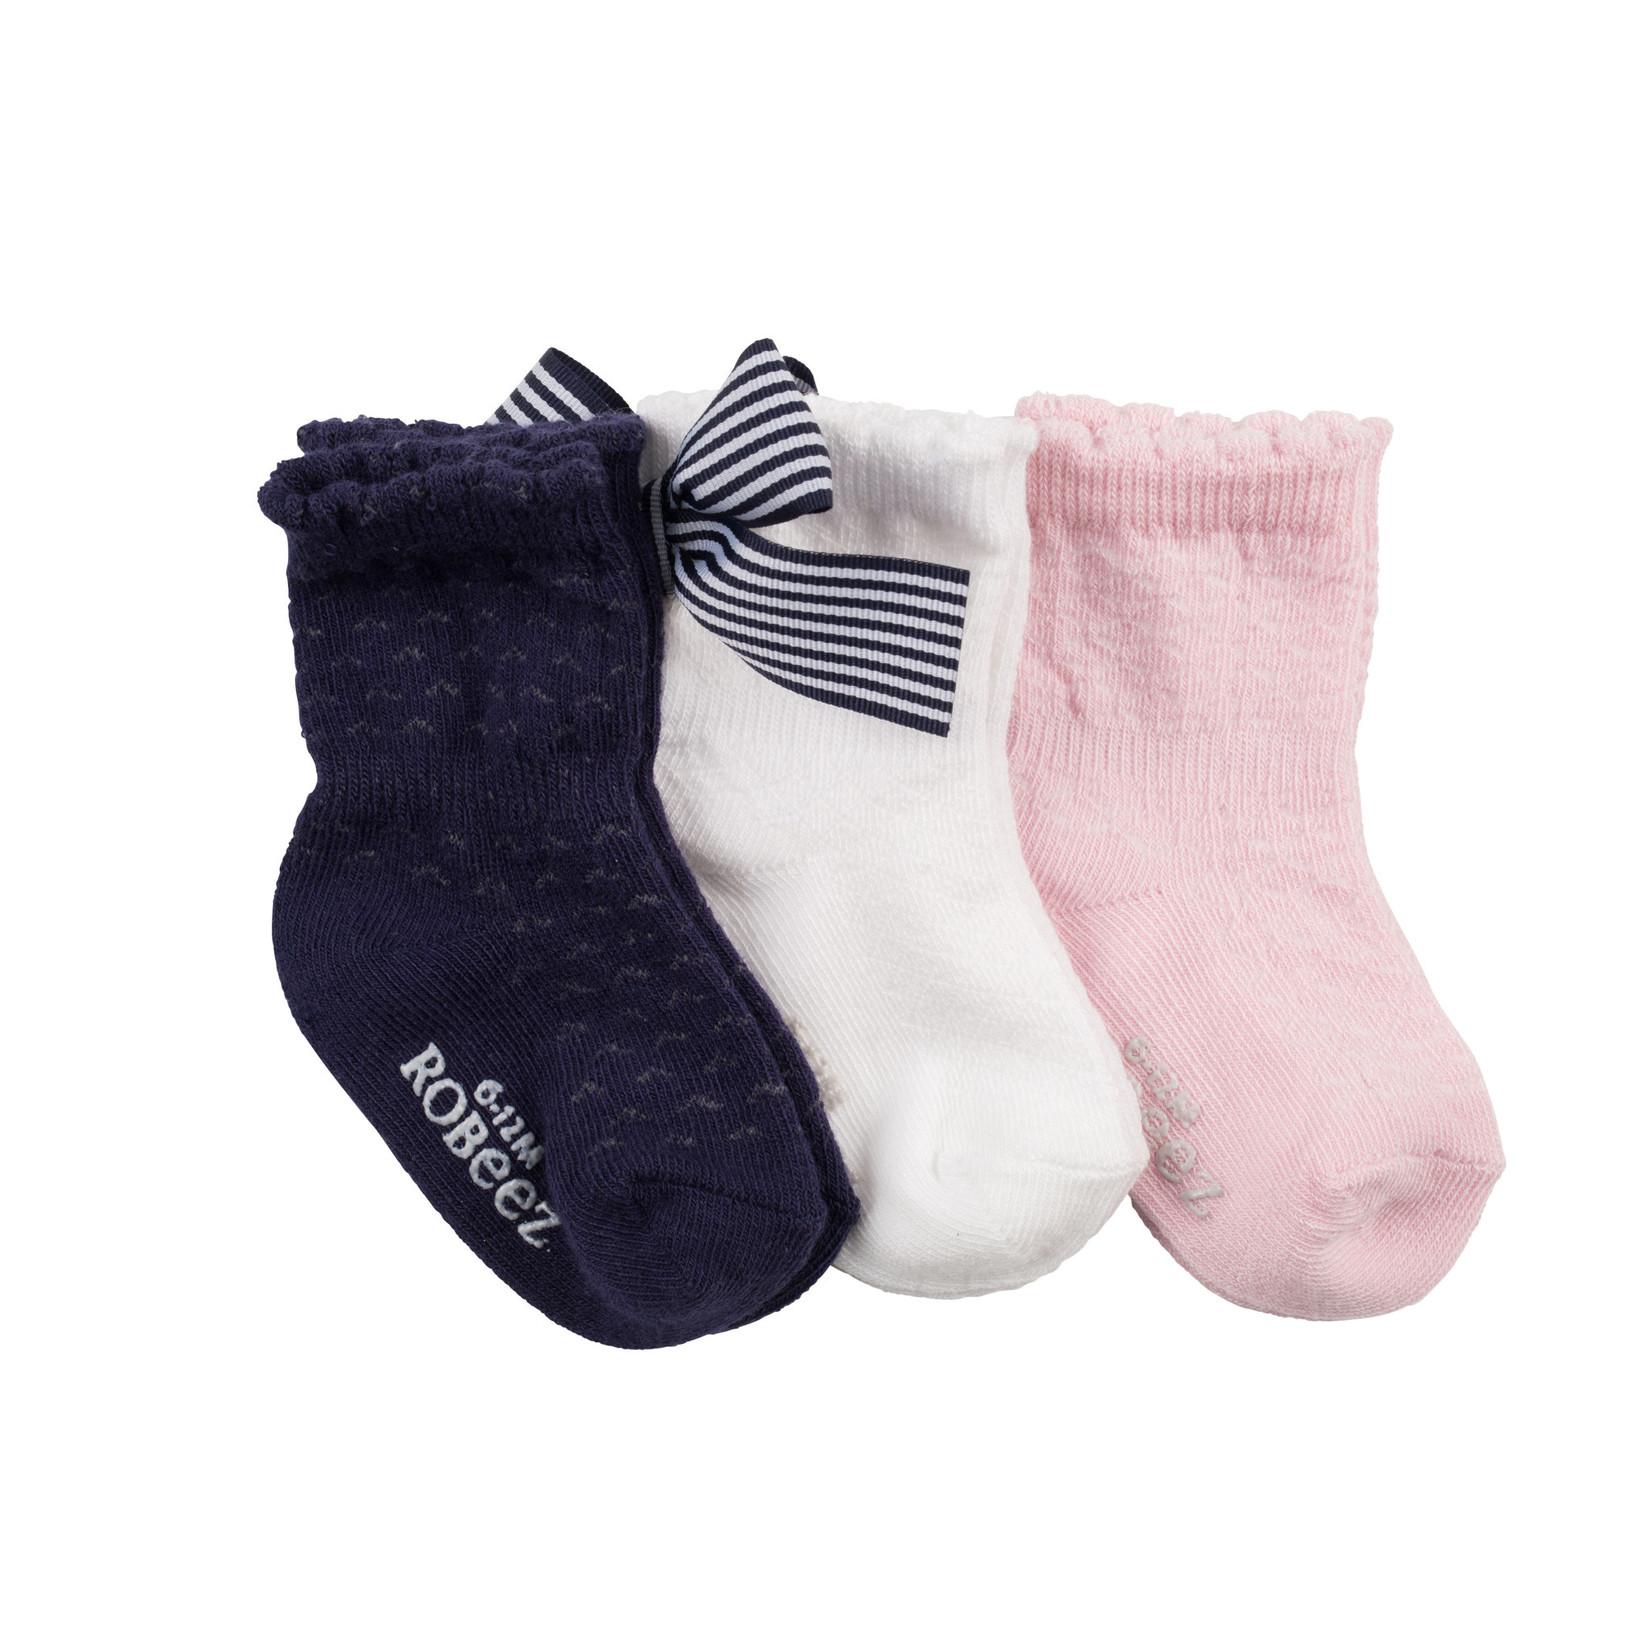 Robeez 3 Pk Socks, Girls Lovely Trio Pink/Navy